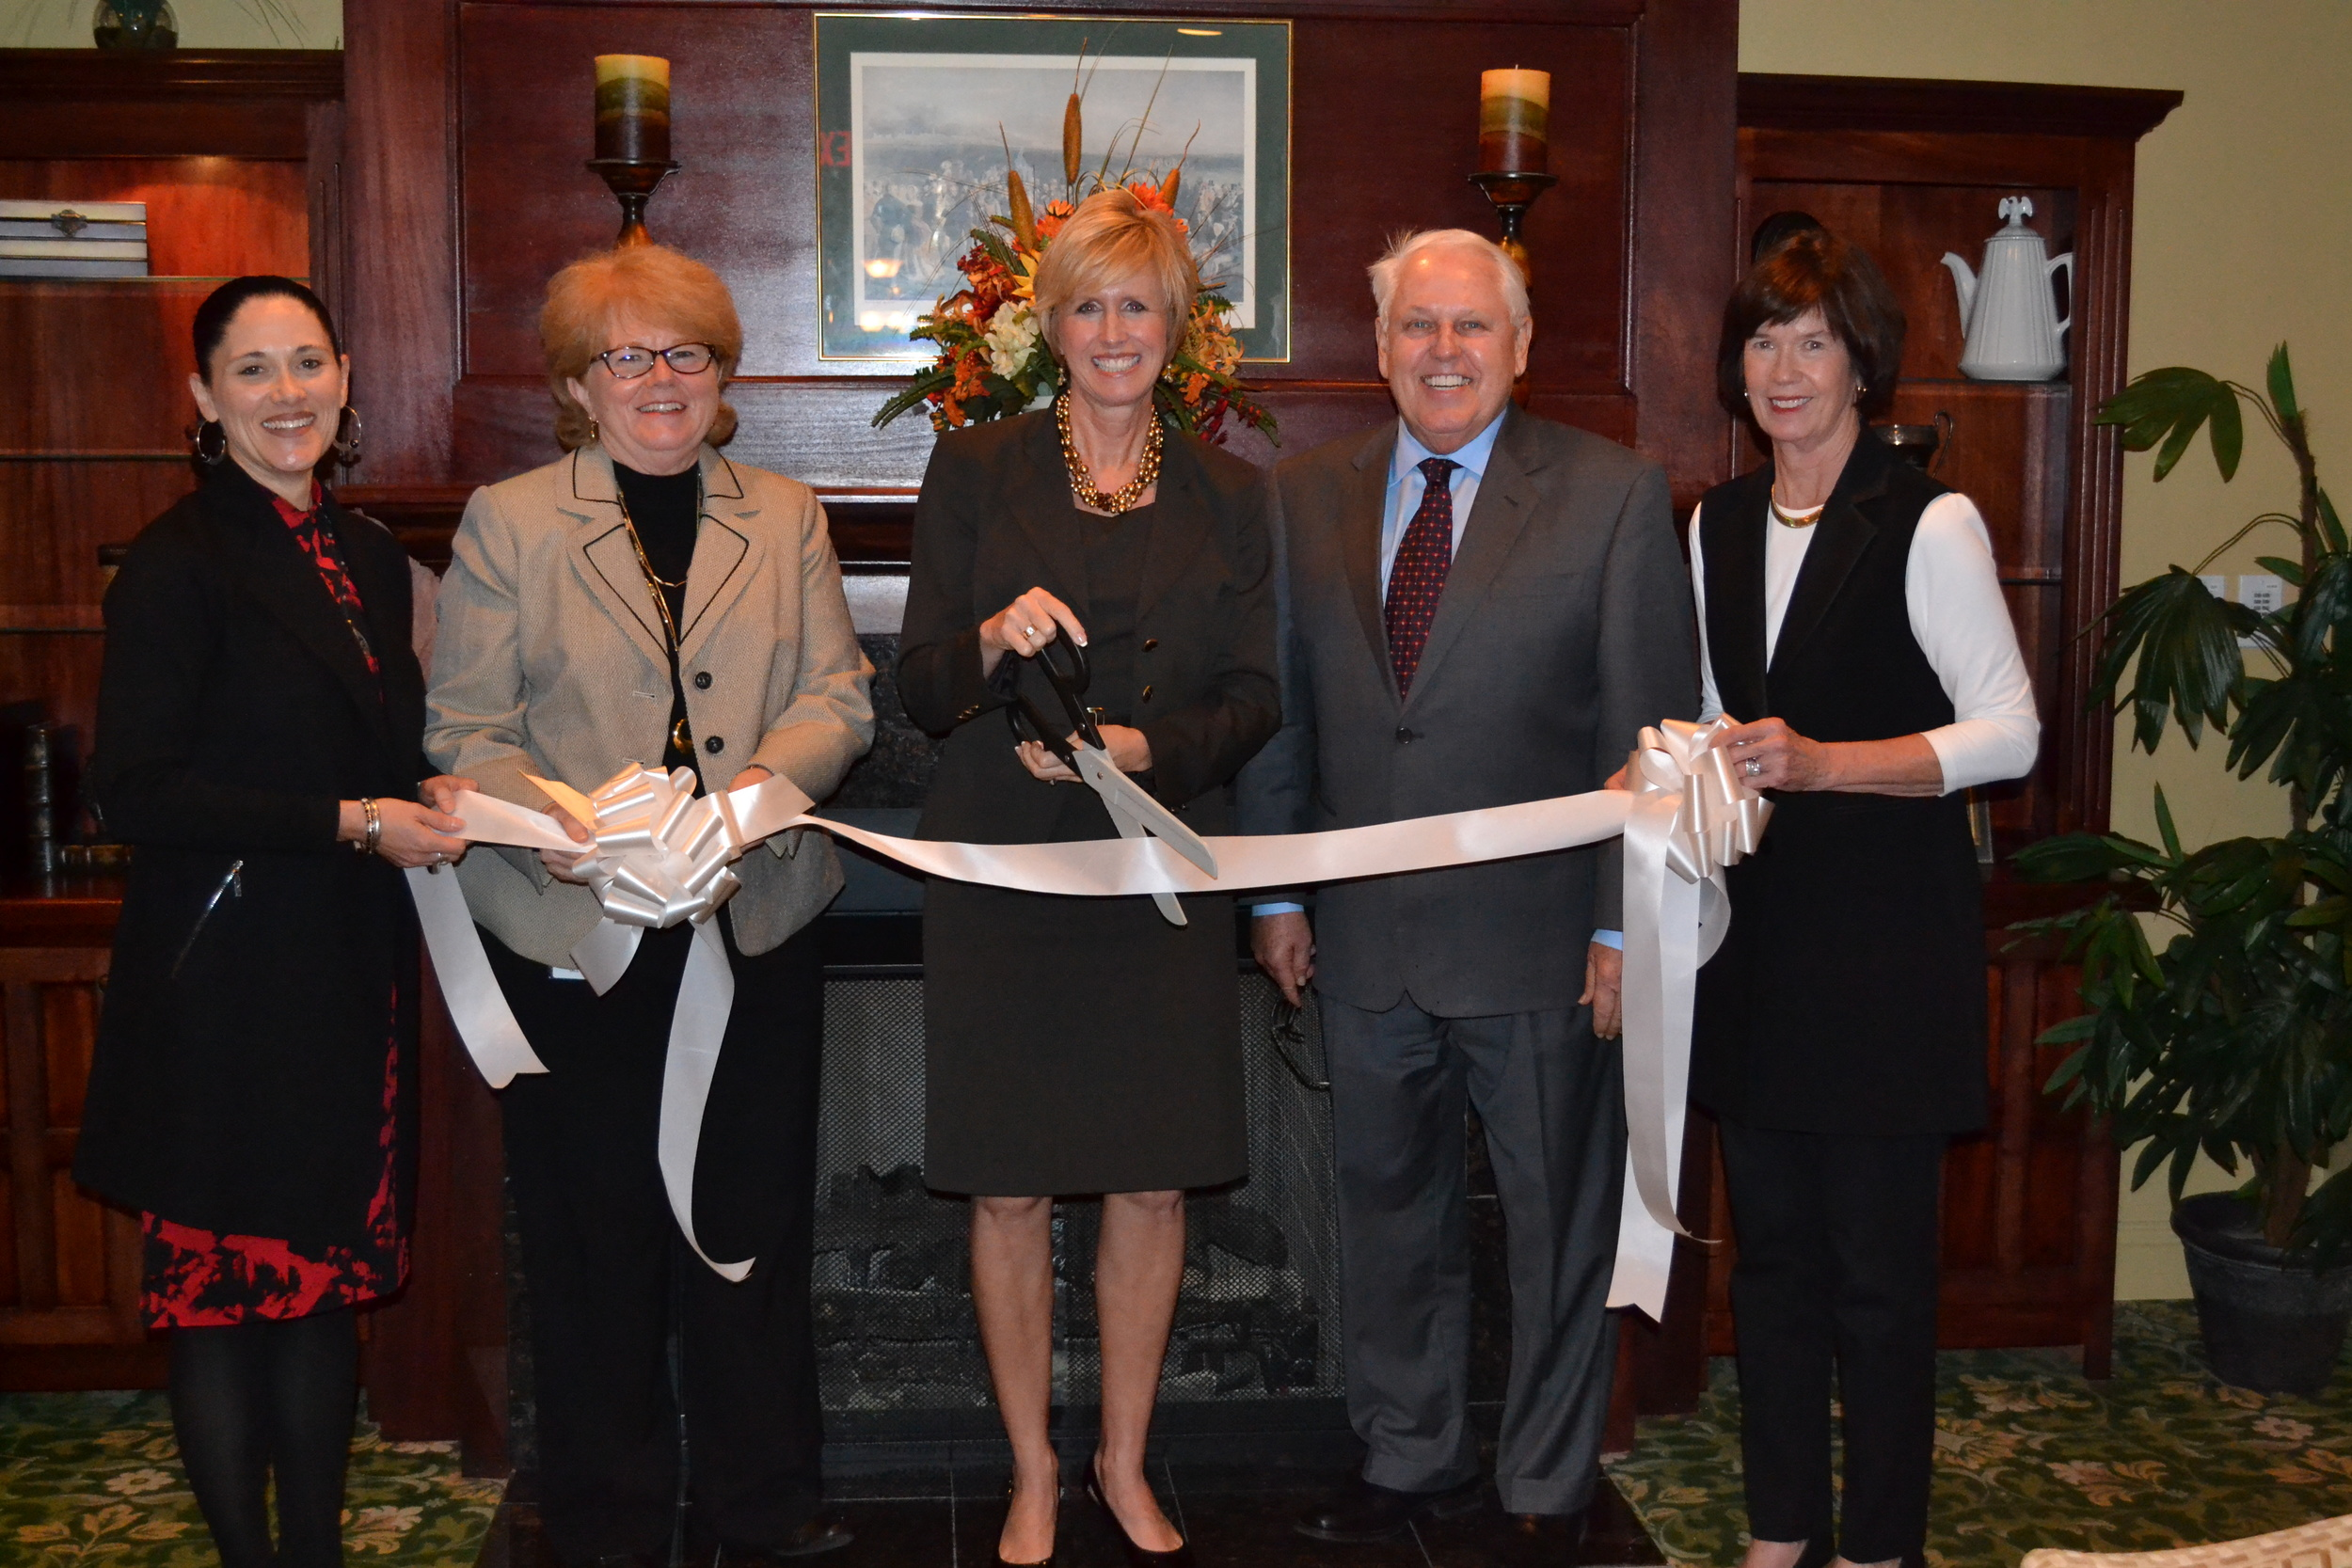 Board of Advisors at CELI's Ribbon Cutting Ceremony: Pam Weber, Linda Gill, Ron Beshear, & Shannon Carter (Not pictured: Nancy Graeter)